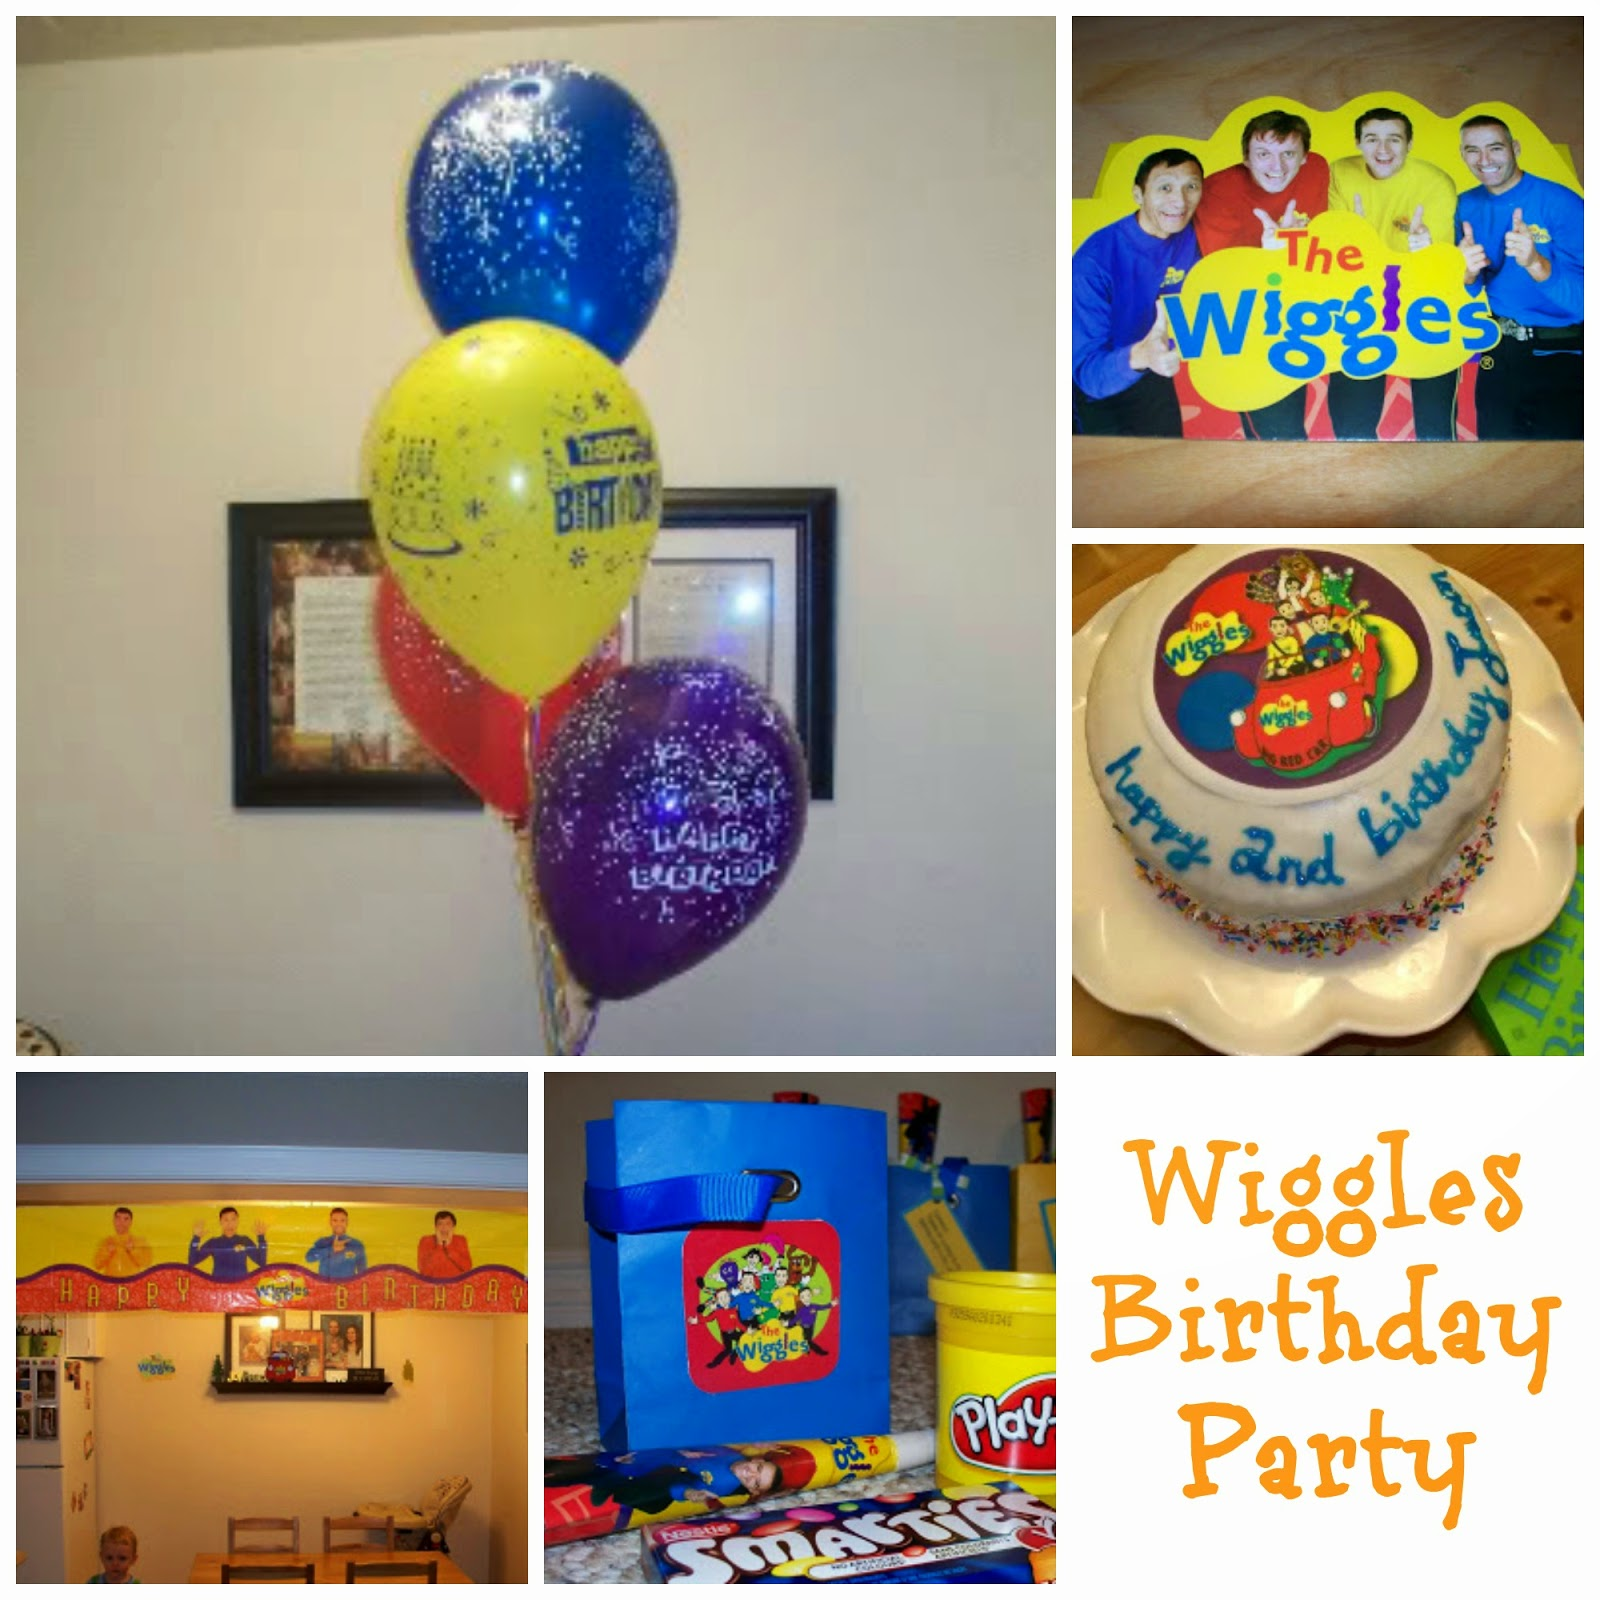 http://craftingandcreativity.blogspot.ca/2011/05/boys-2nd-birthday-party-wiggles-theme.html